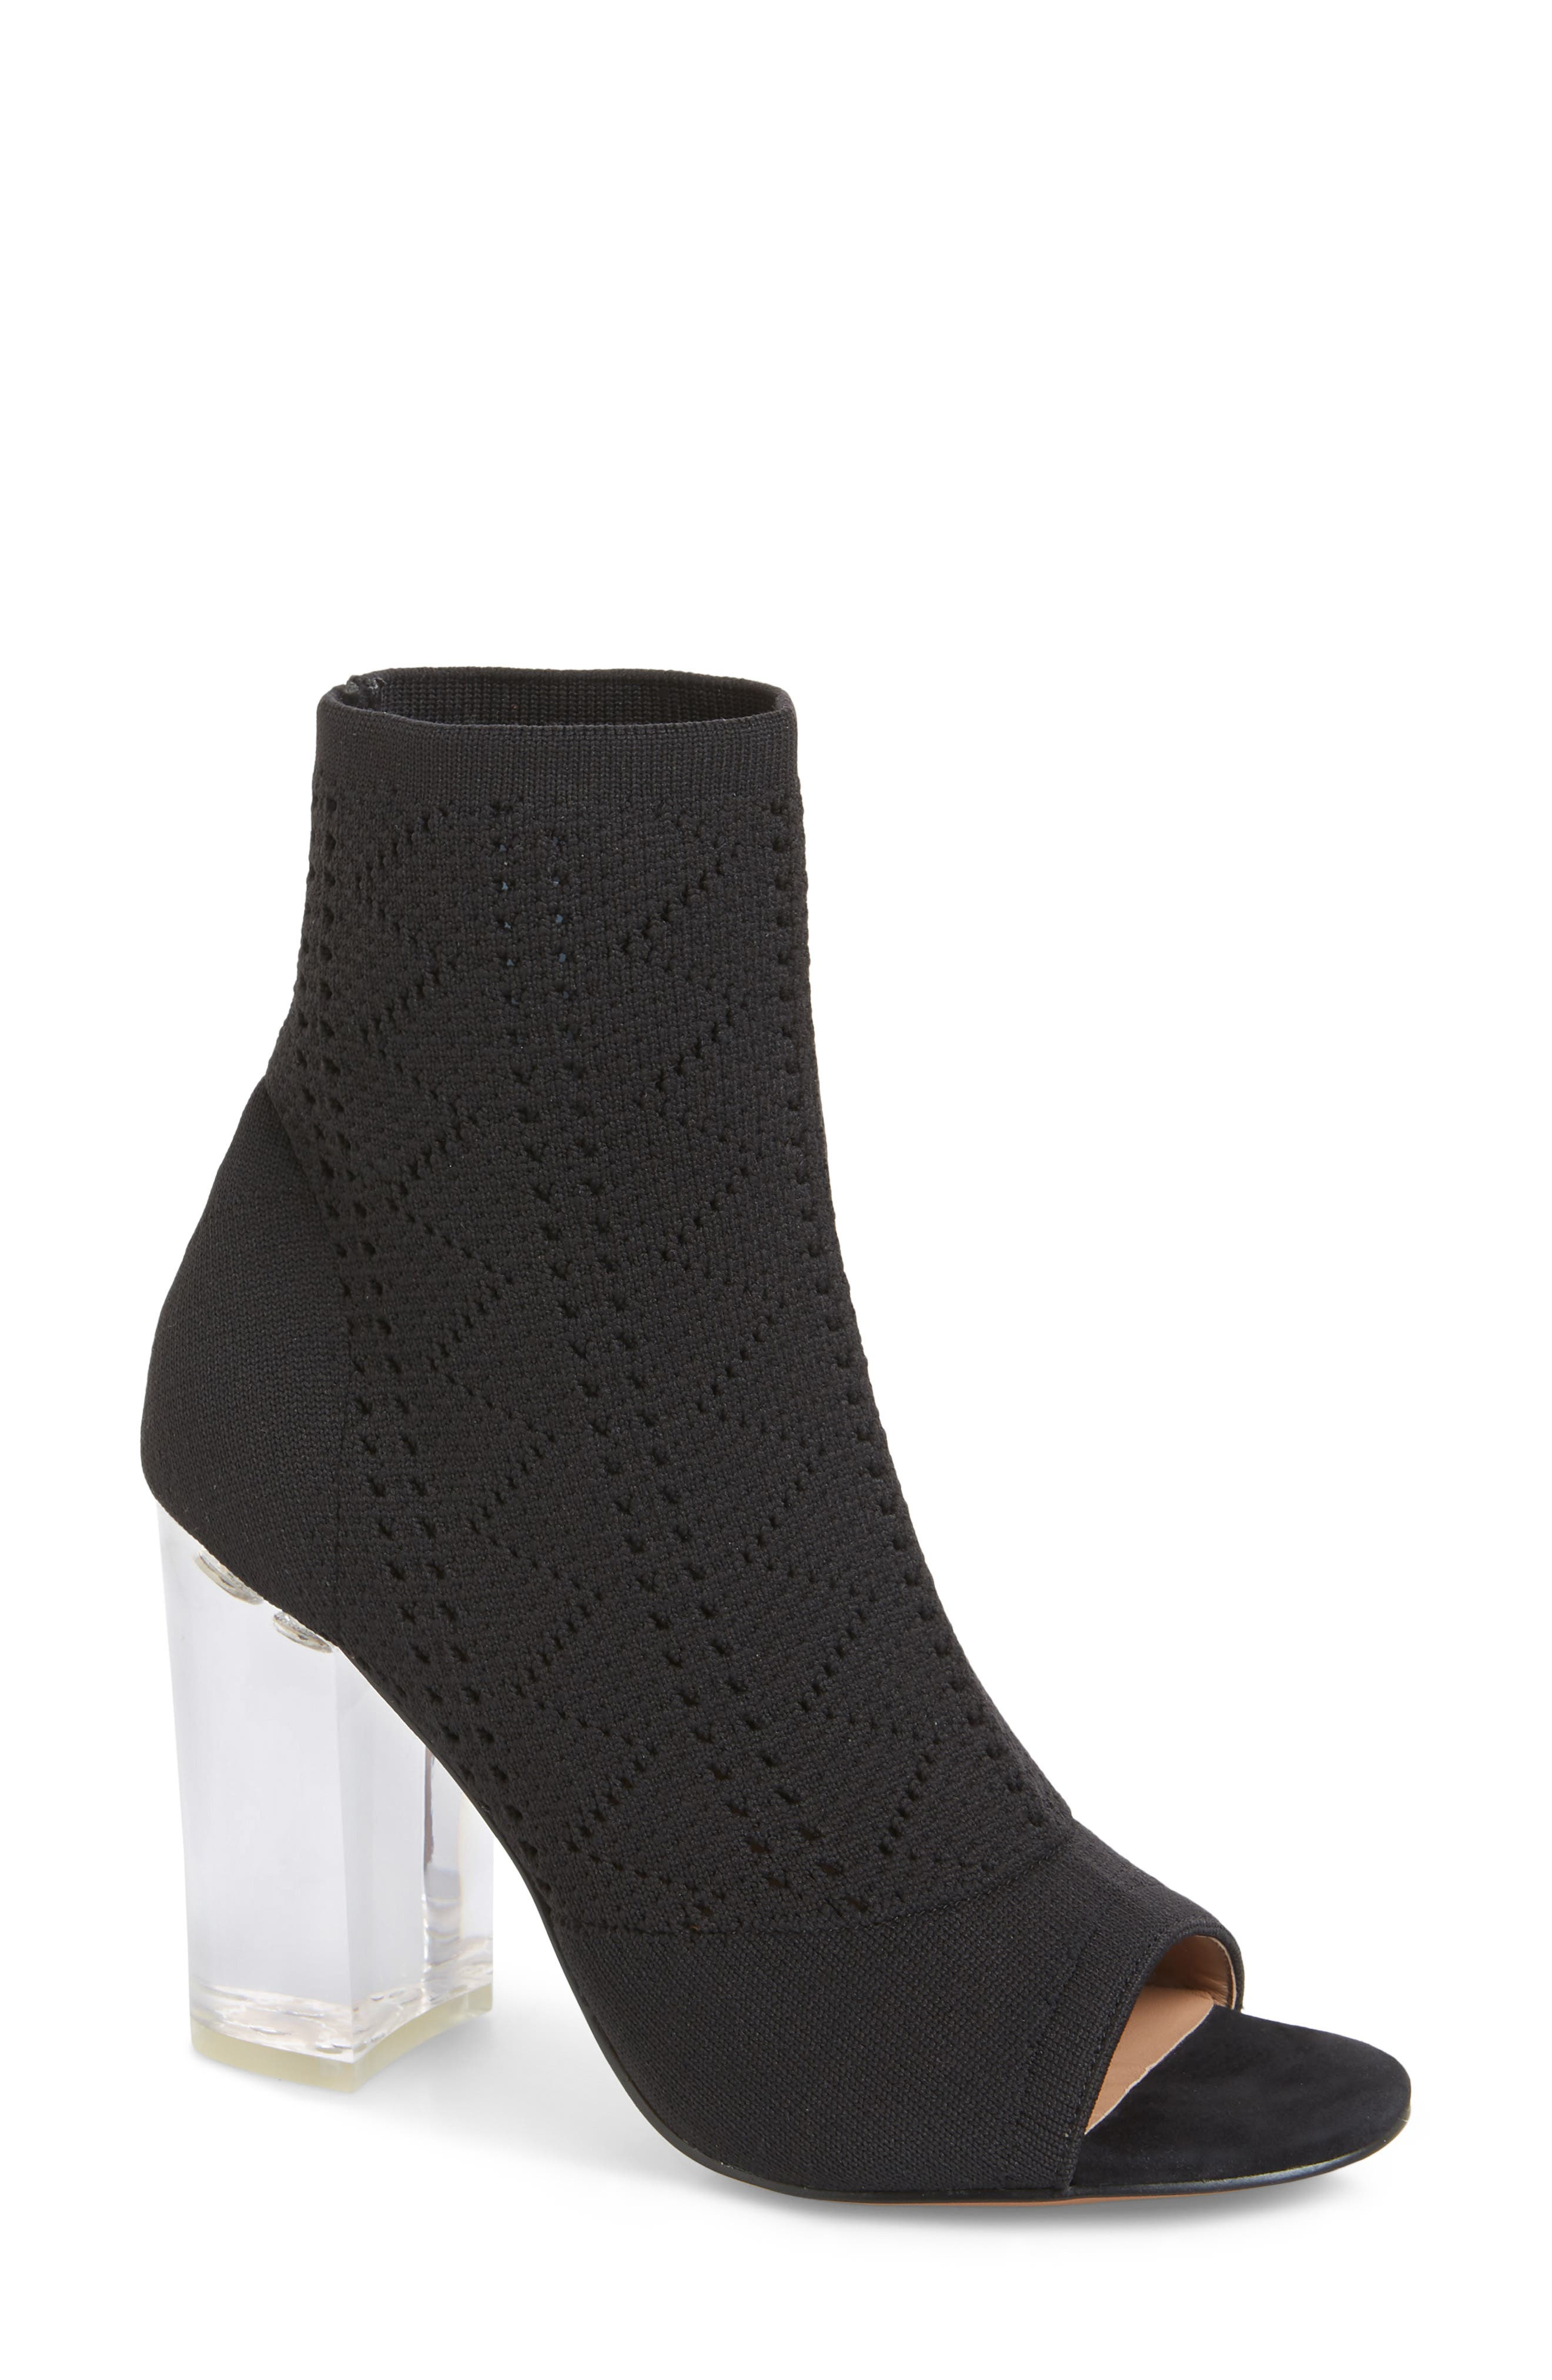 Hollis Peep Toe Sock Bootie,                             Main thumbnail 1, color,                             BLACK FABRIC